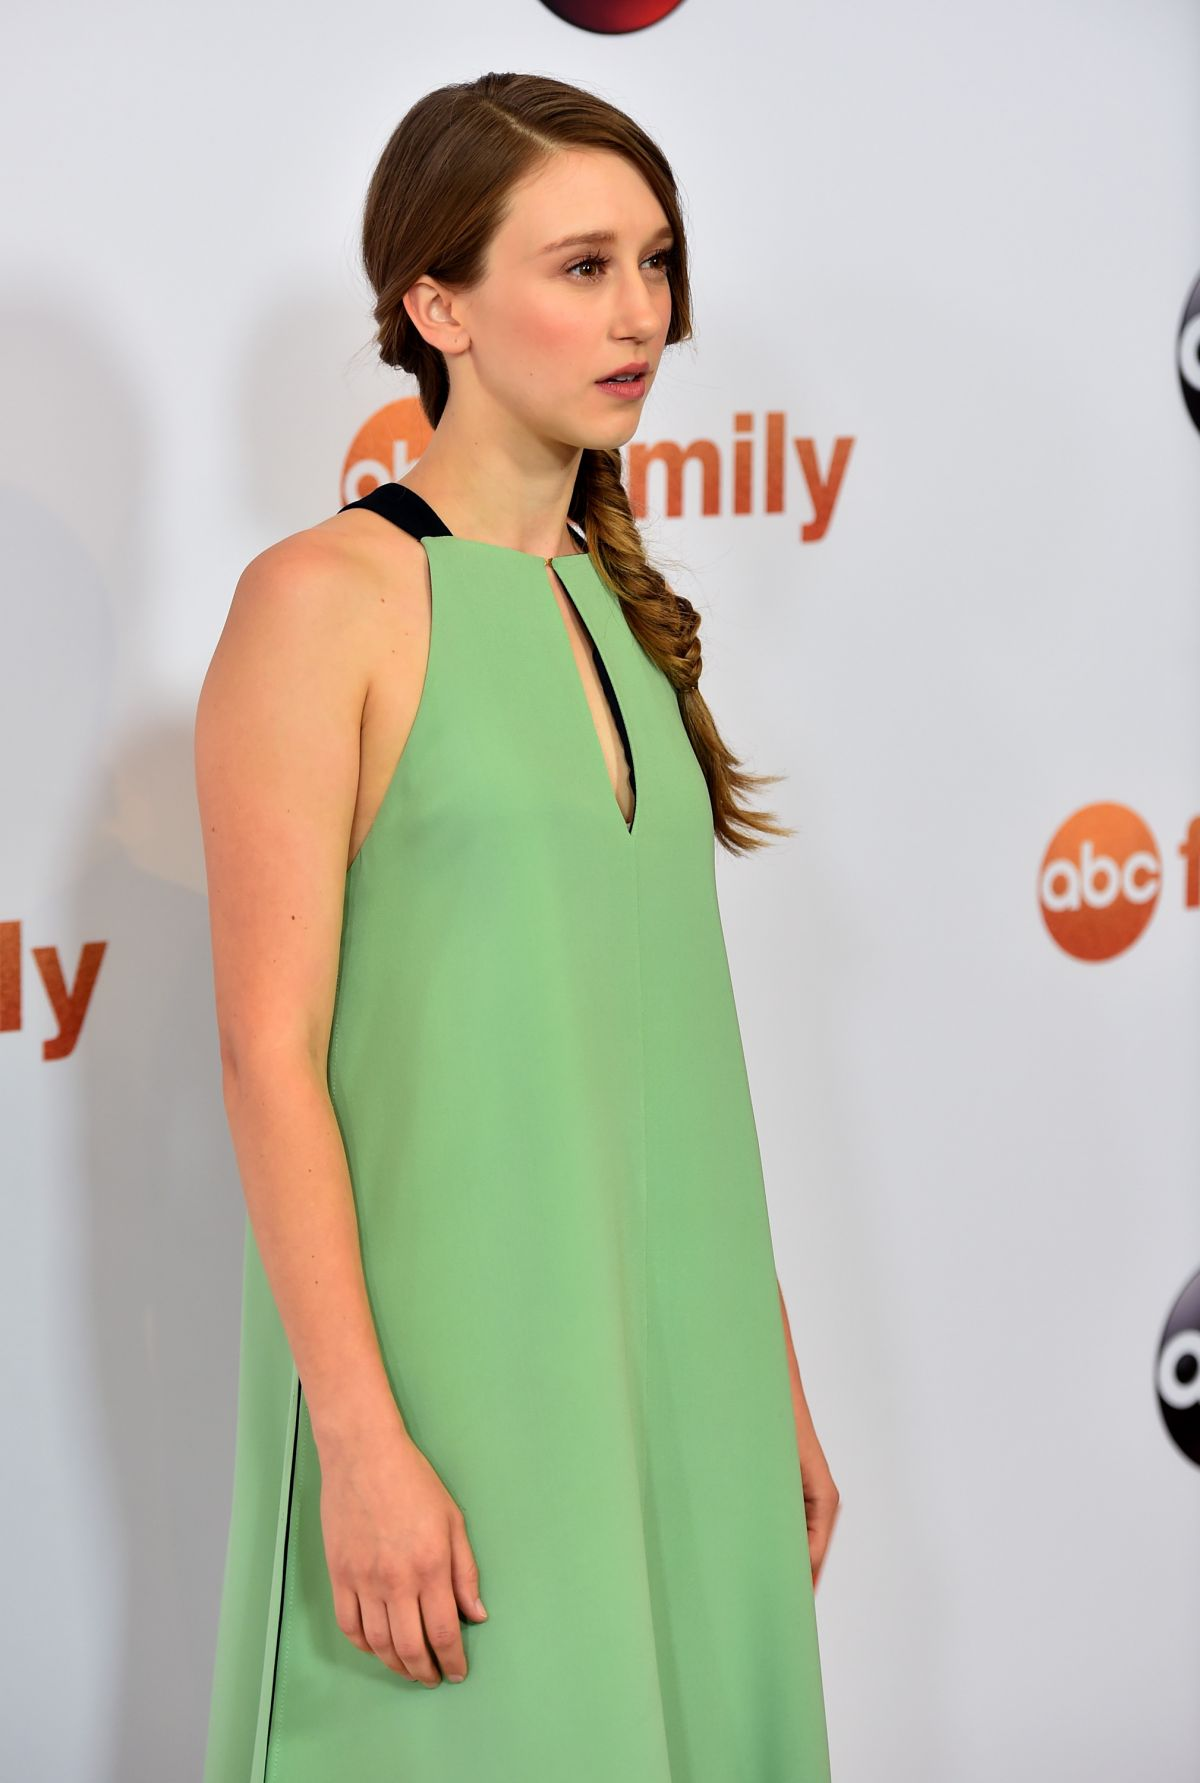 TAISSA FARMIGA at Disney ABC 2015 Summer TCA Tour in Beverly Hills